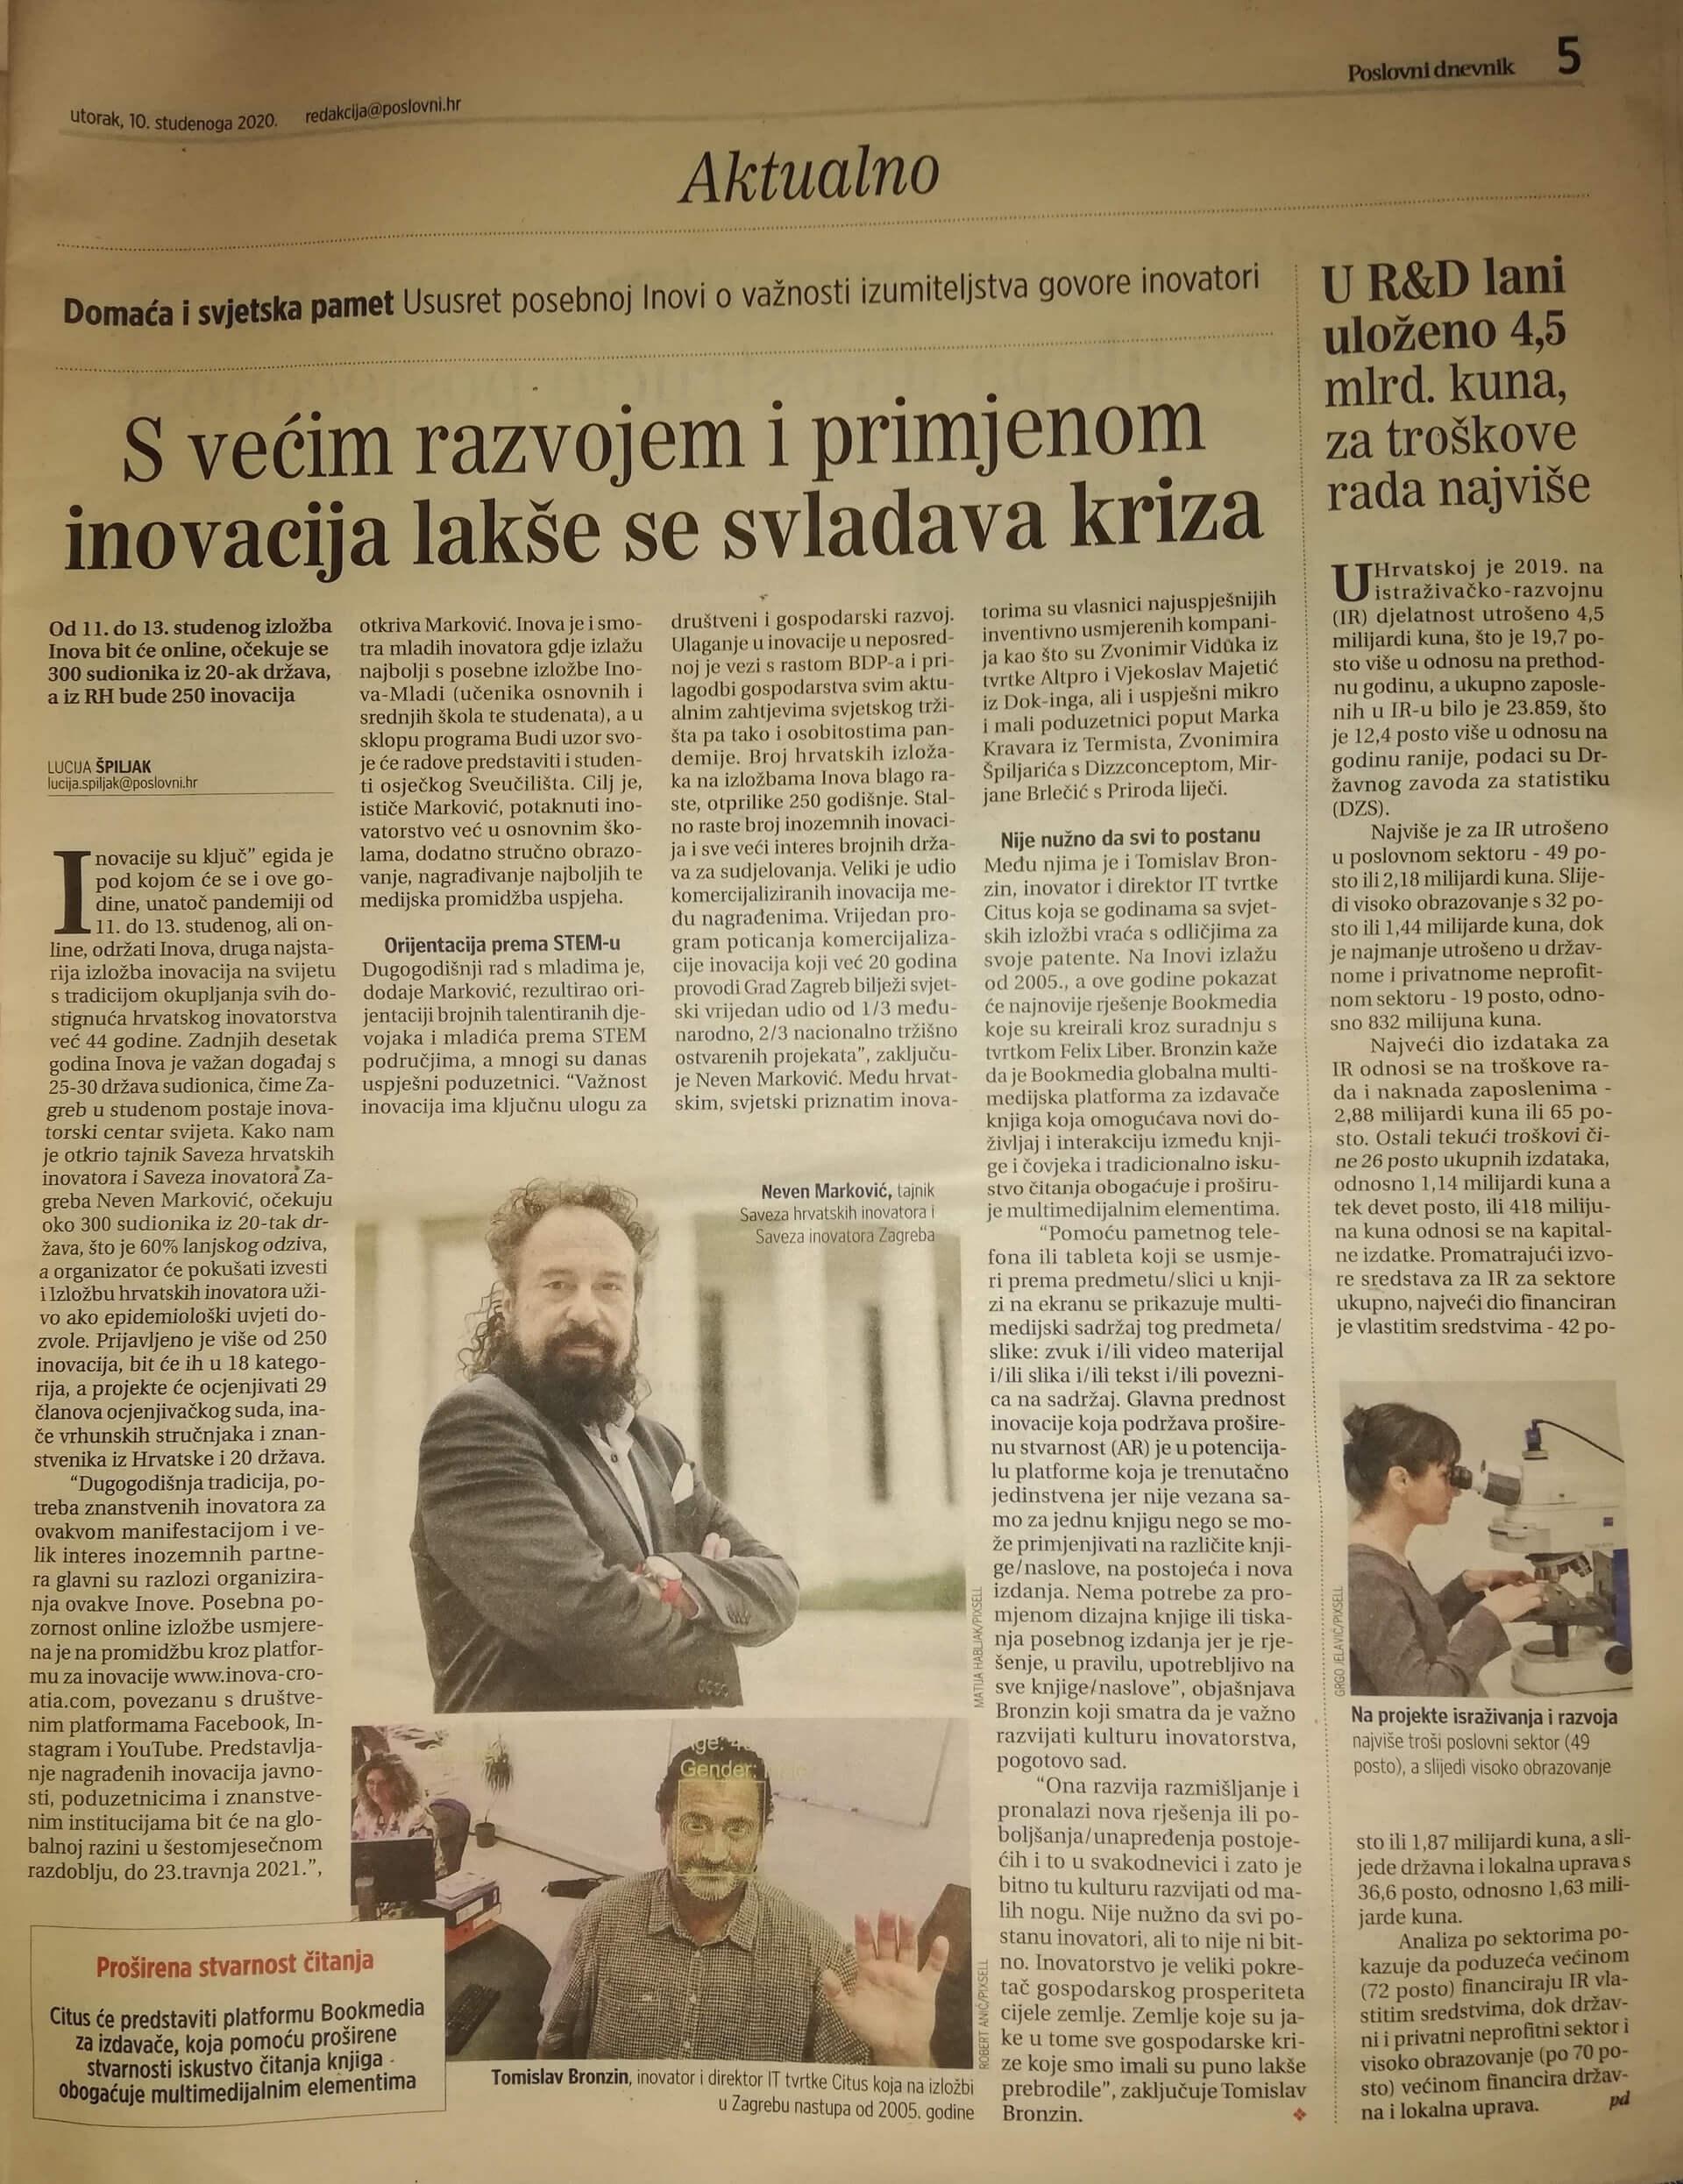 Poslovni dnevnik, 10.11.2020.